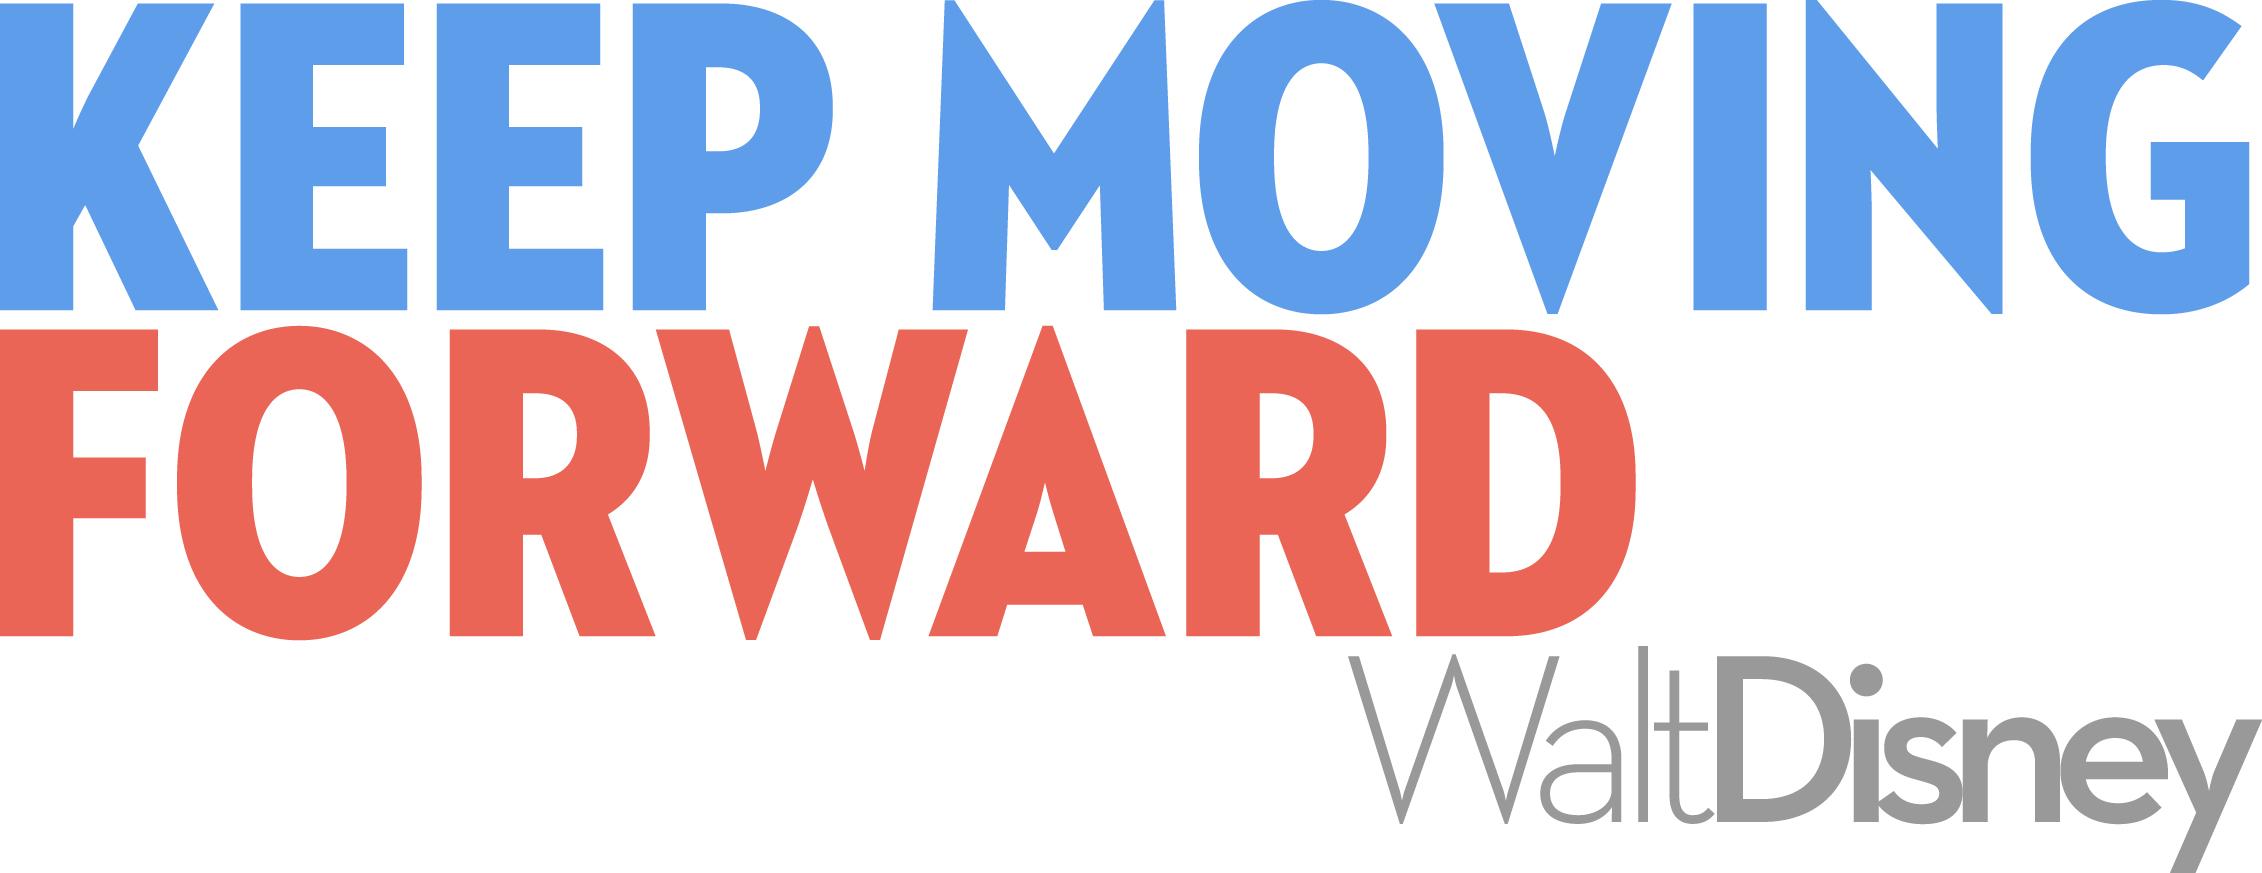 walt disney quotes keep moving forward - photo #11